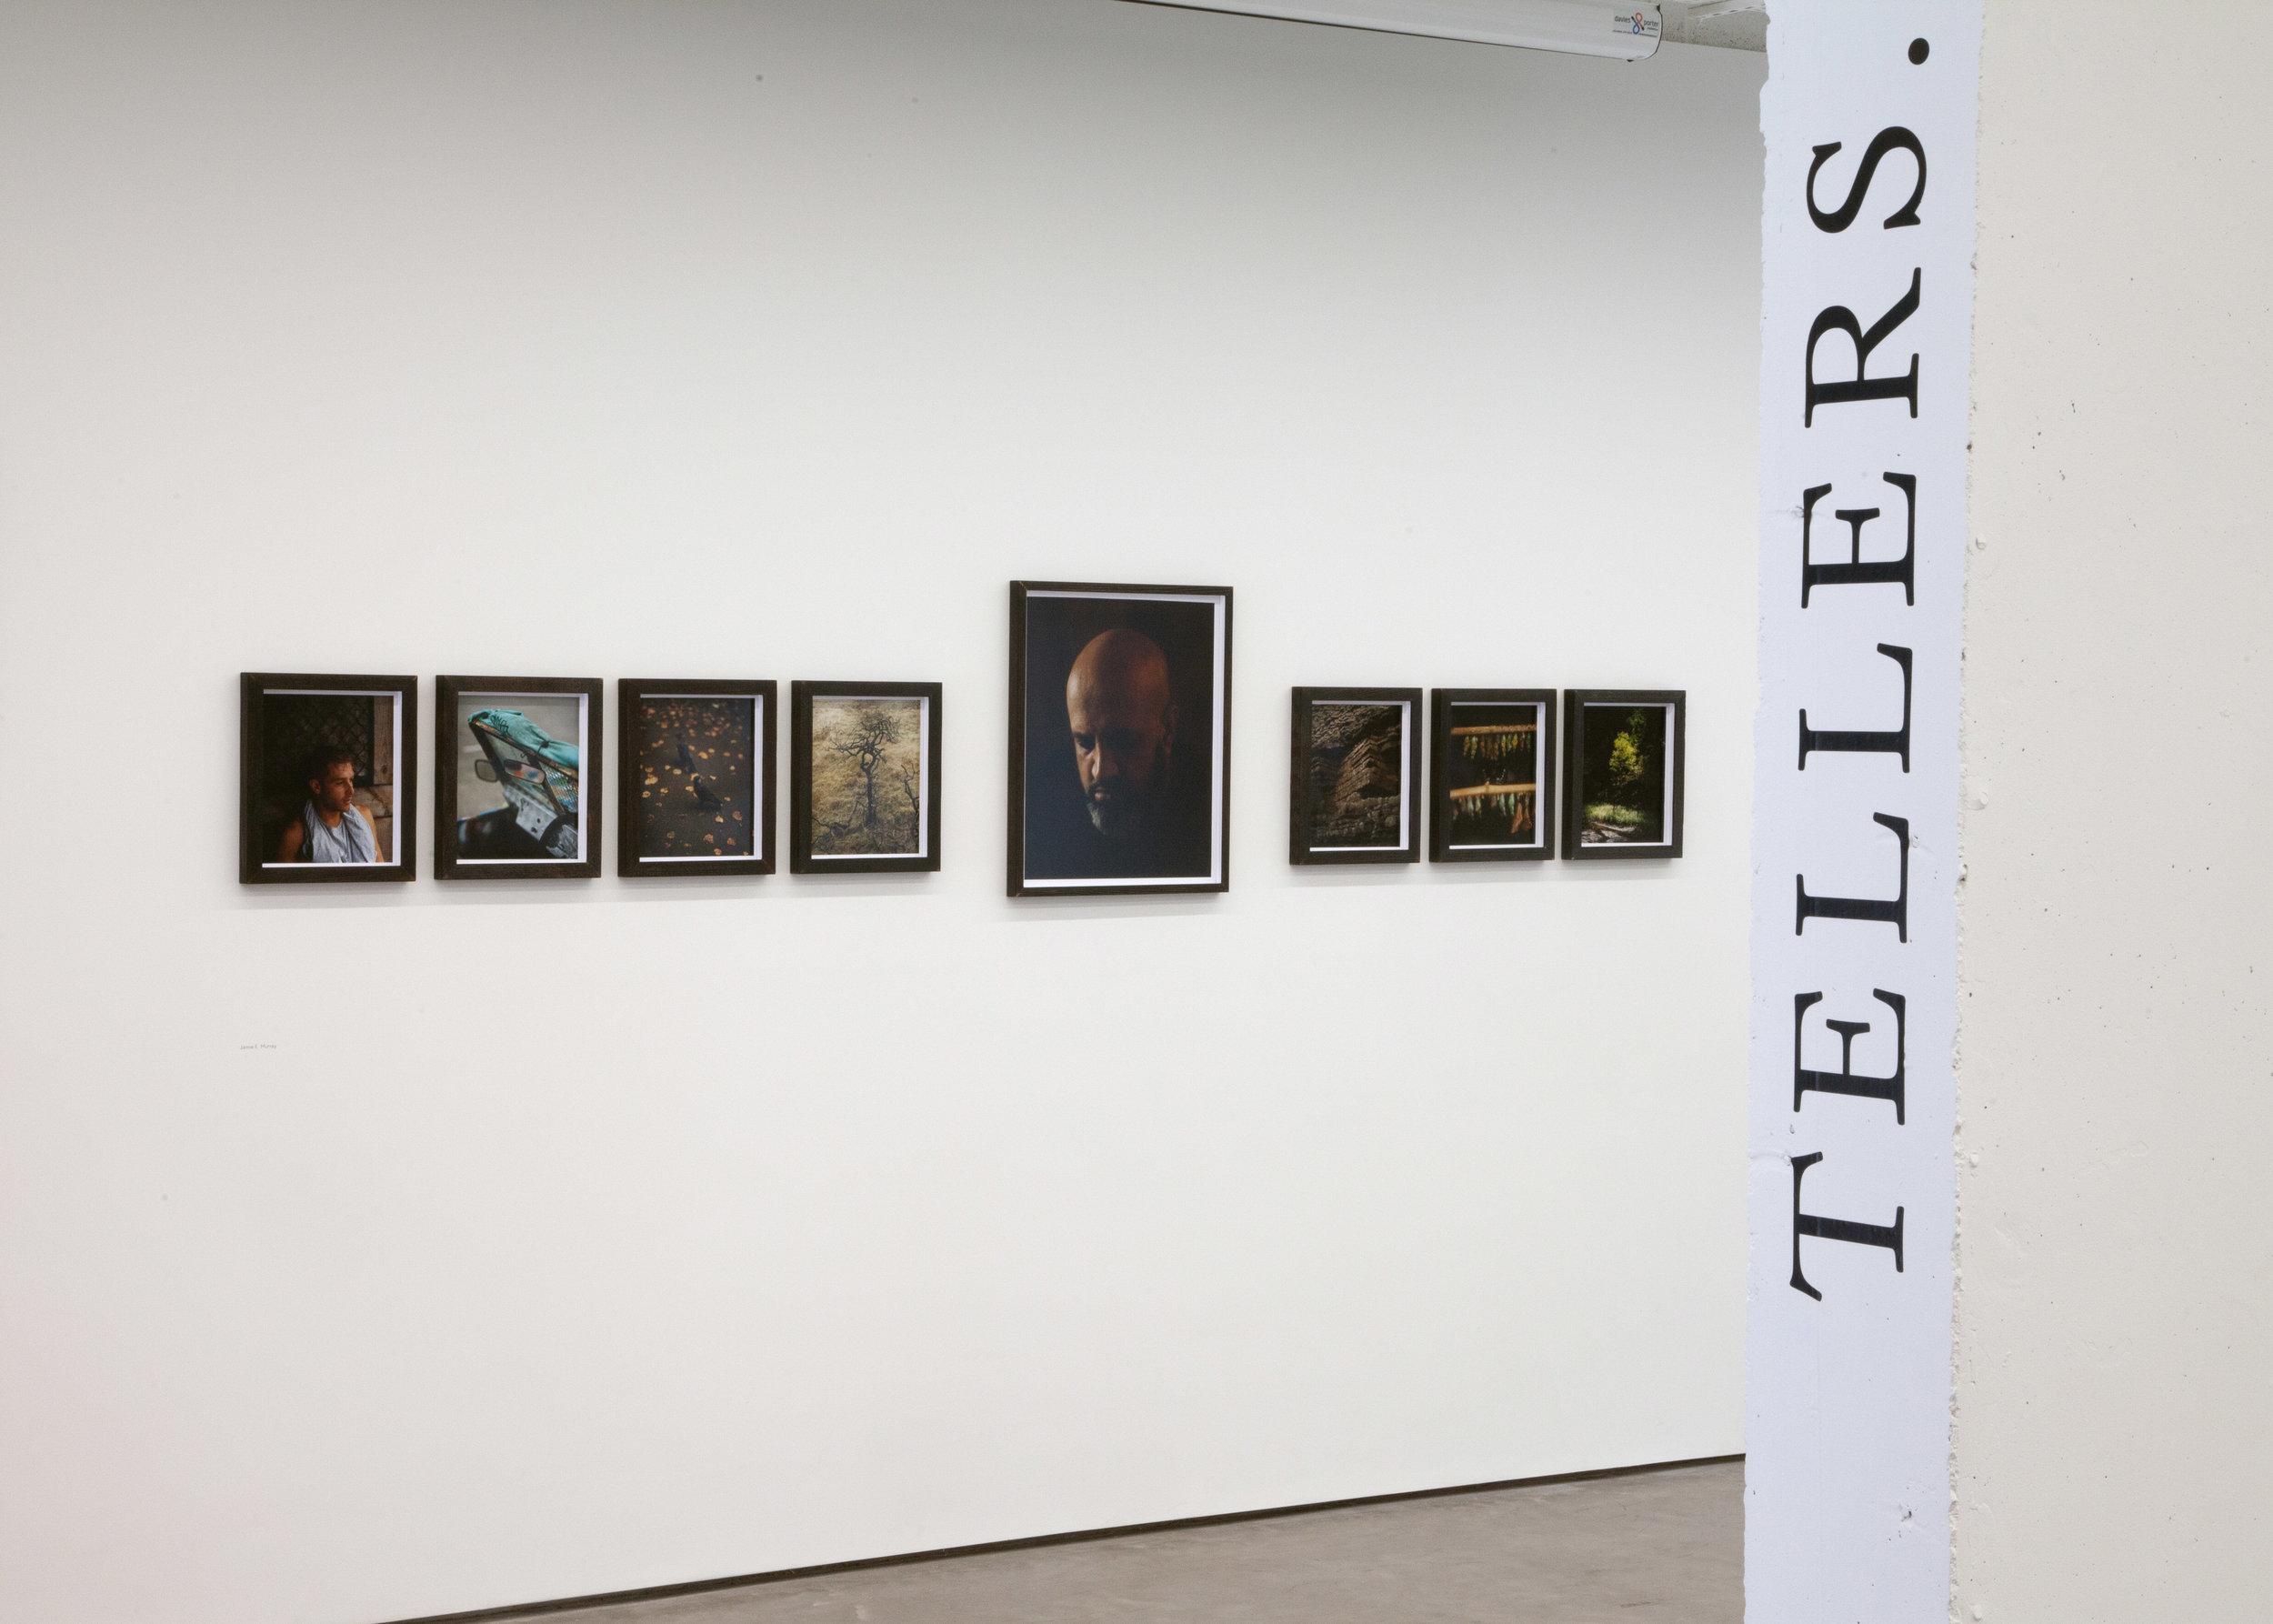 Martin Parr Foundation / Tellers Exhibition